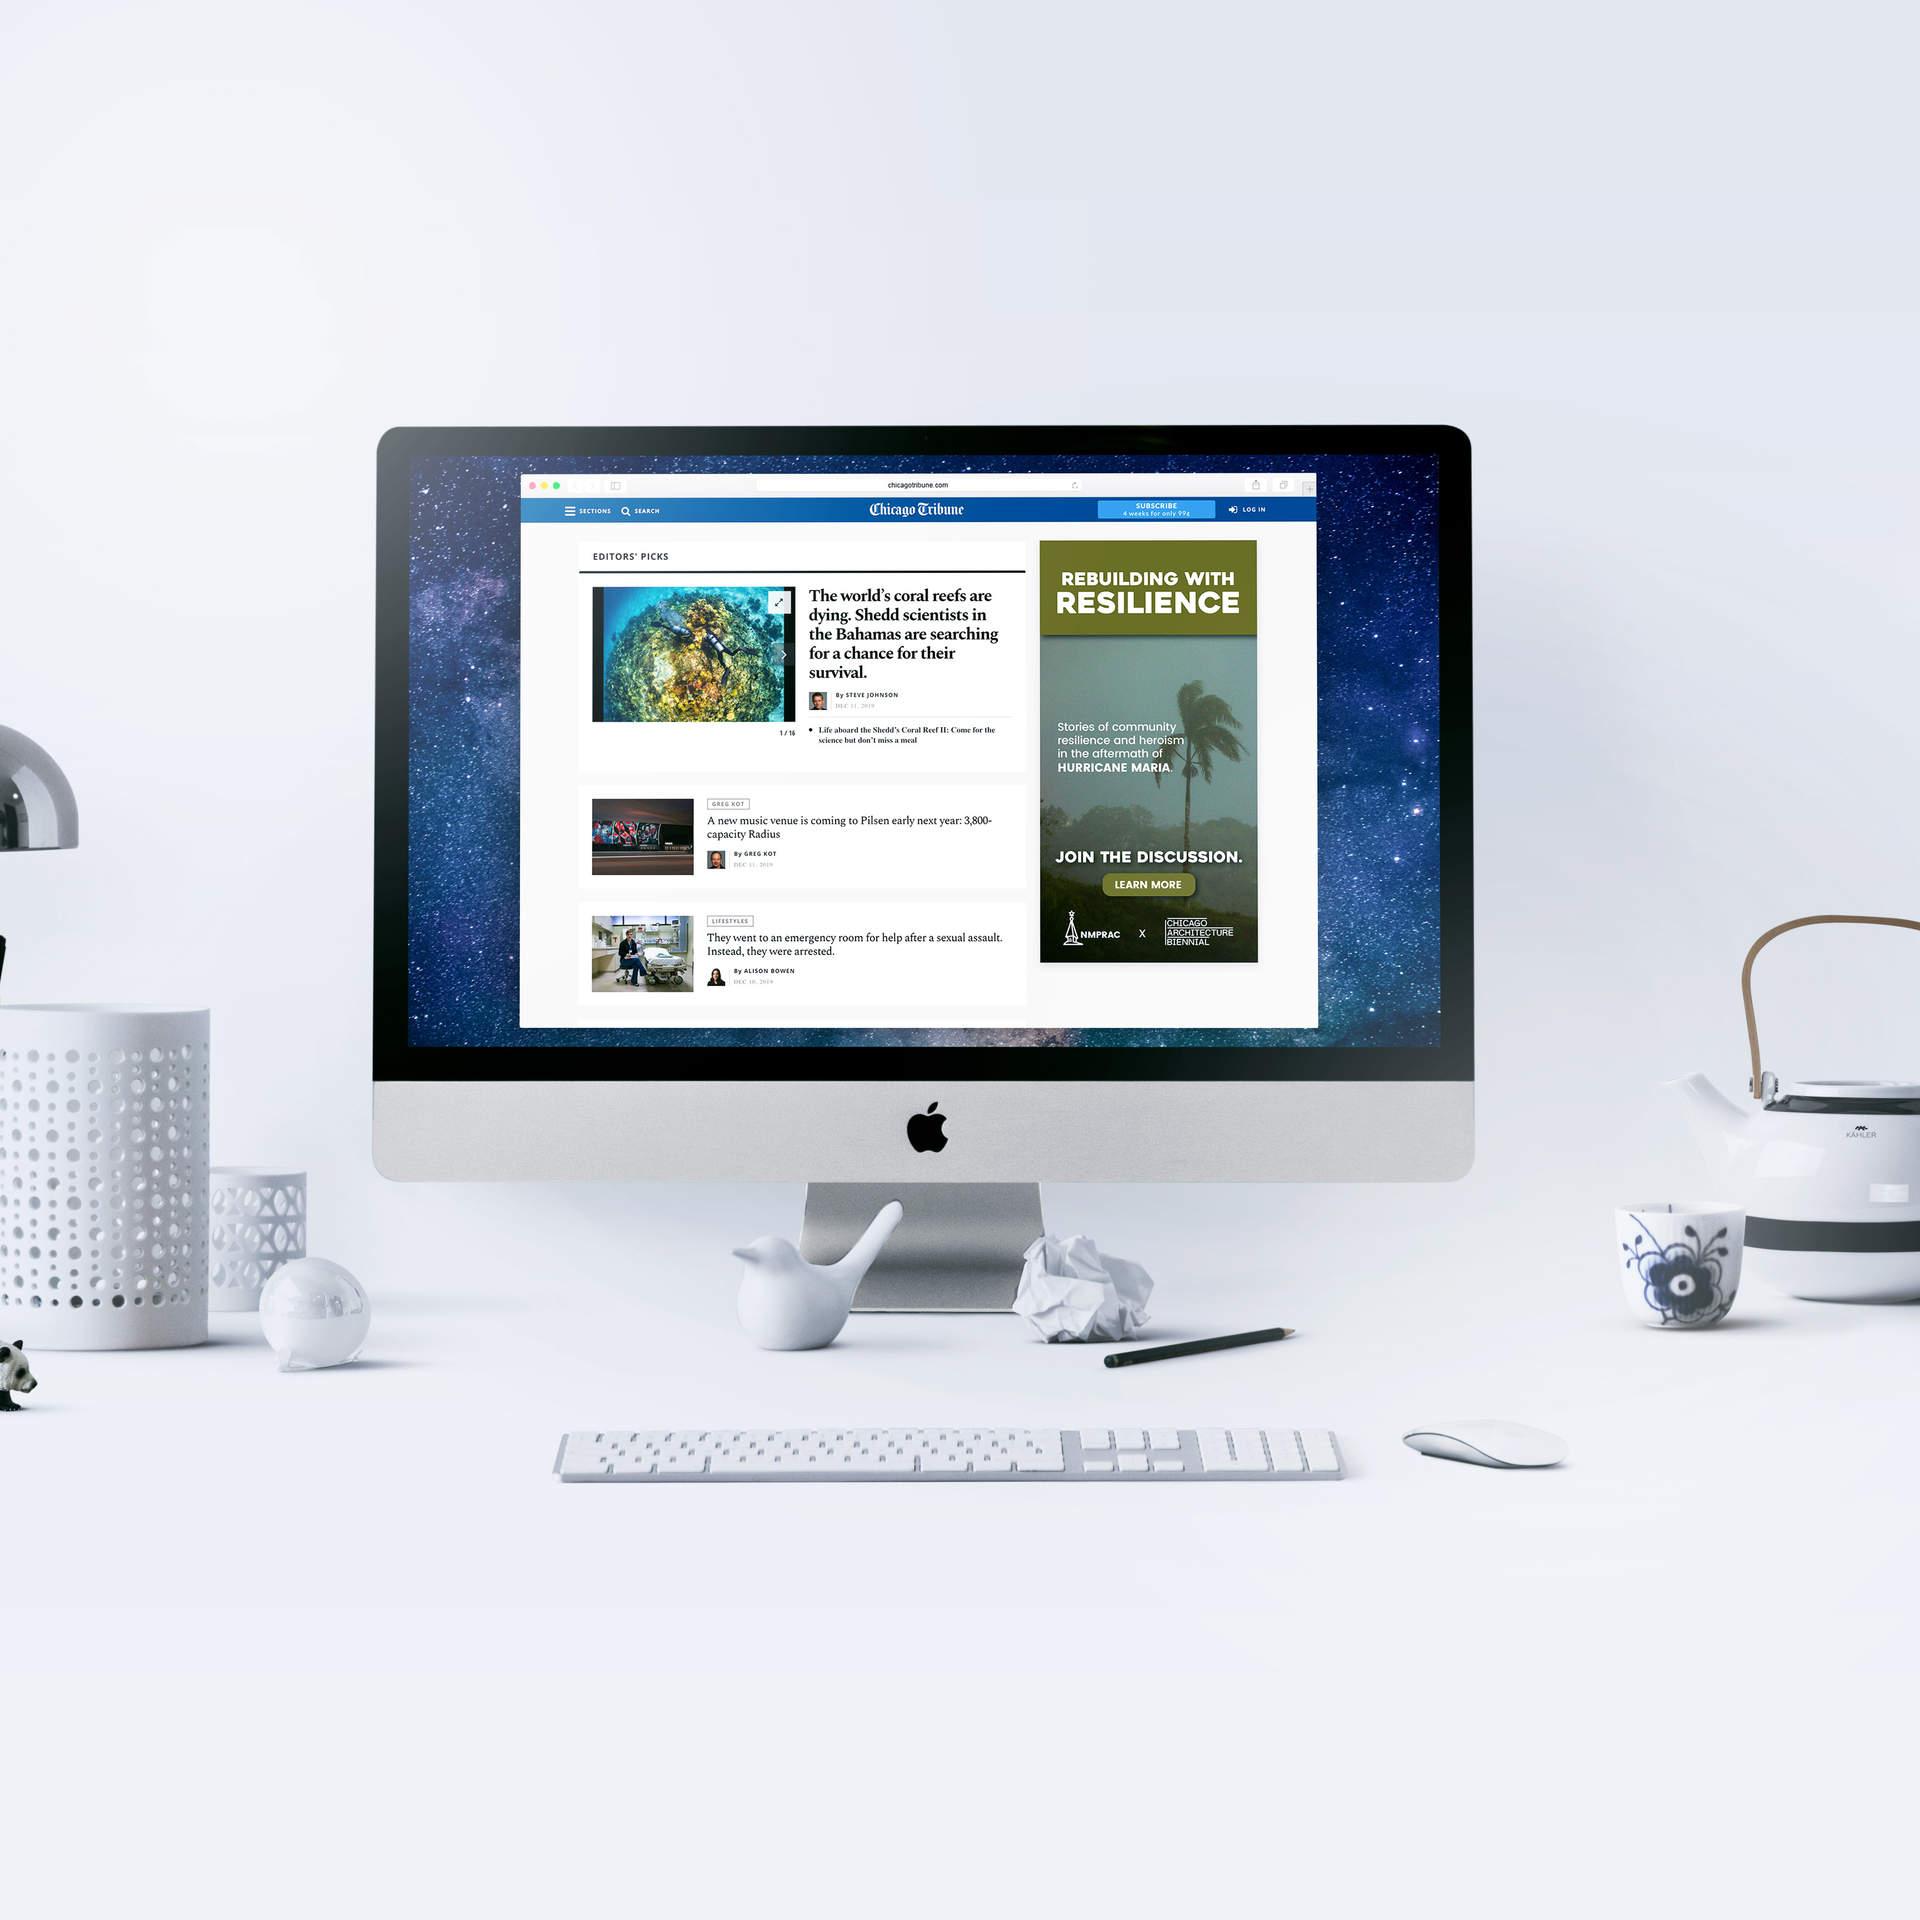 nmprac web banner desktop mockup.jpg